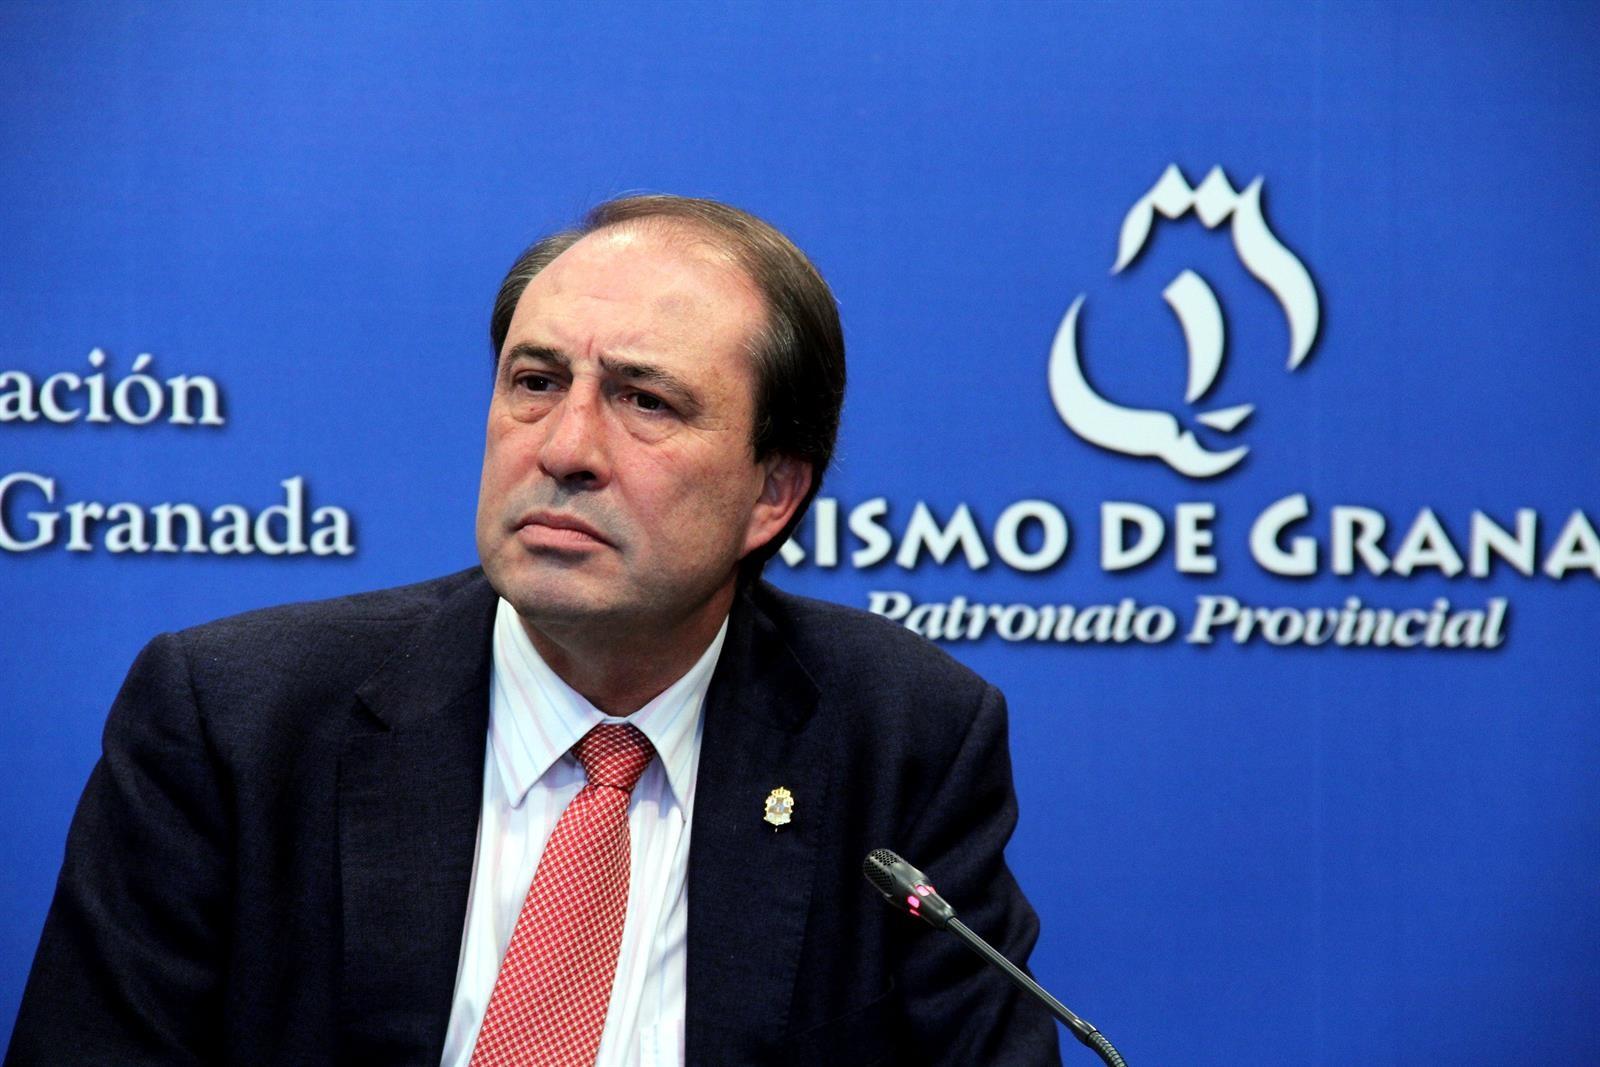 Fallece Francisco Tarifa, exdiputado provincial de Turismo